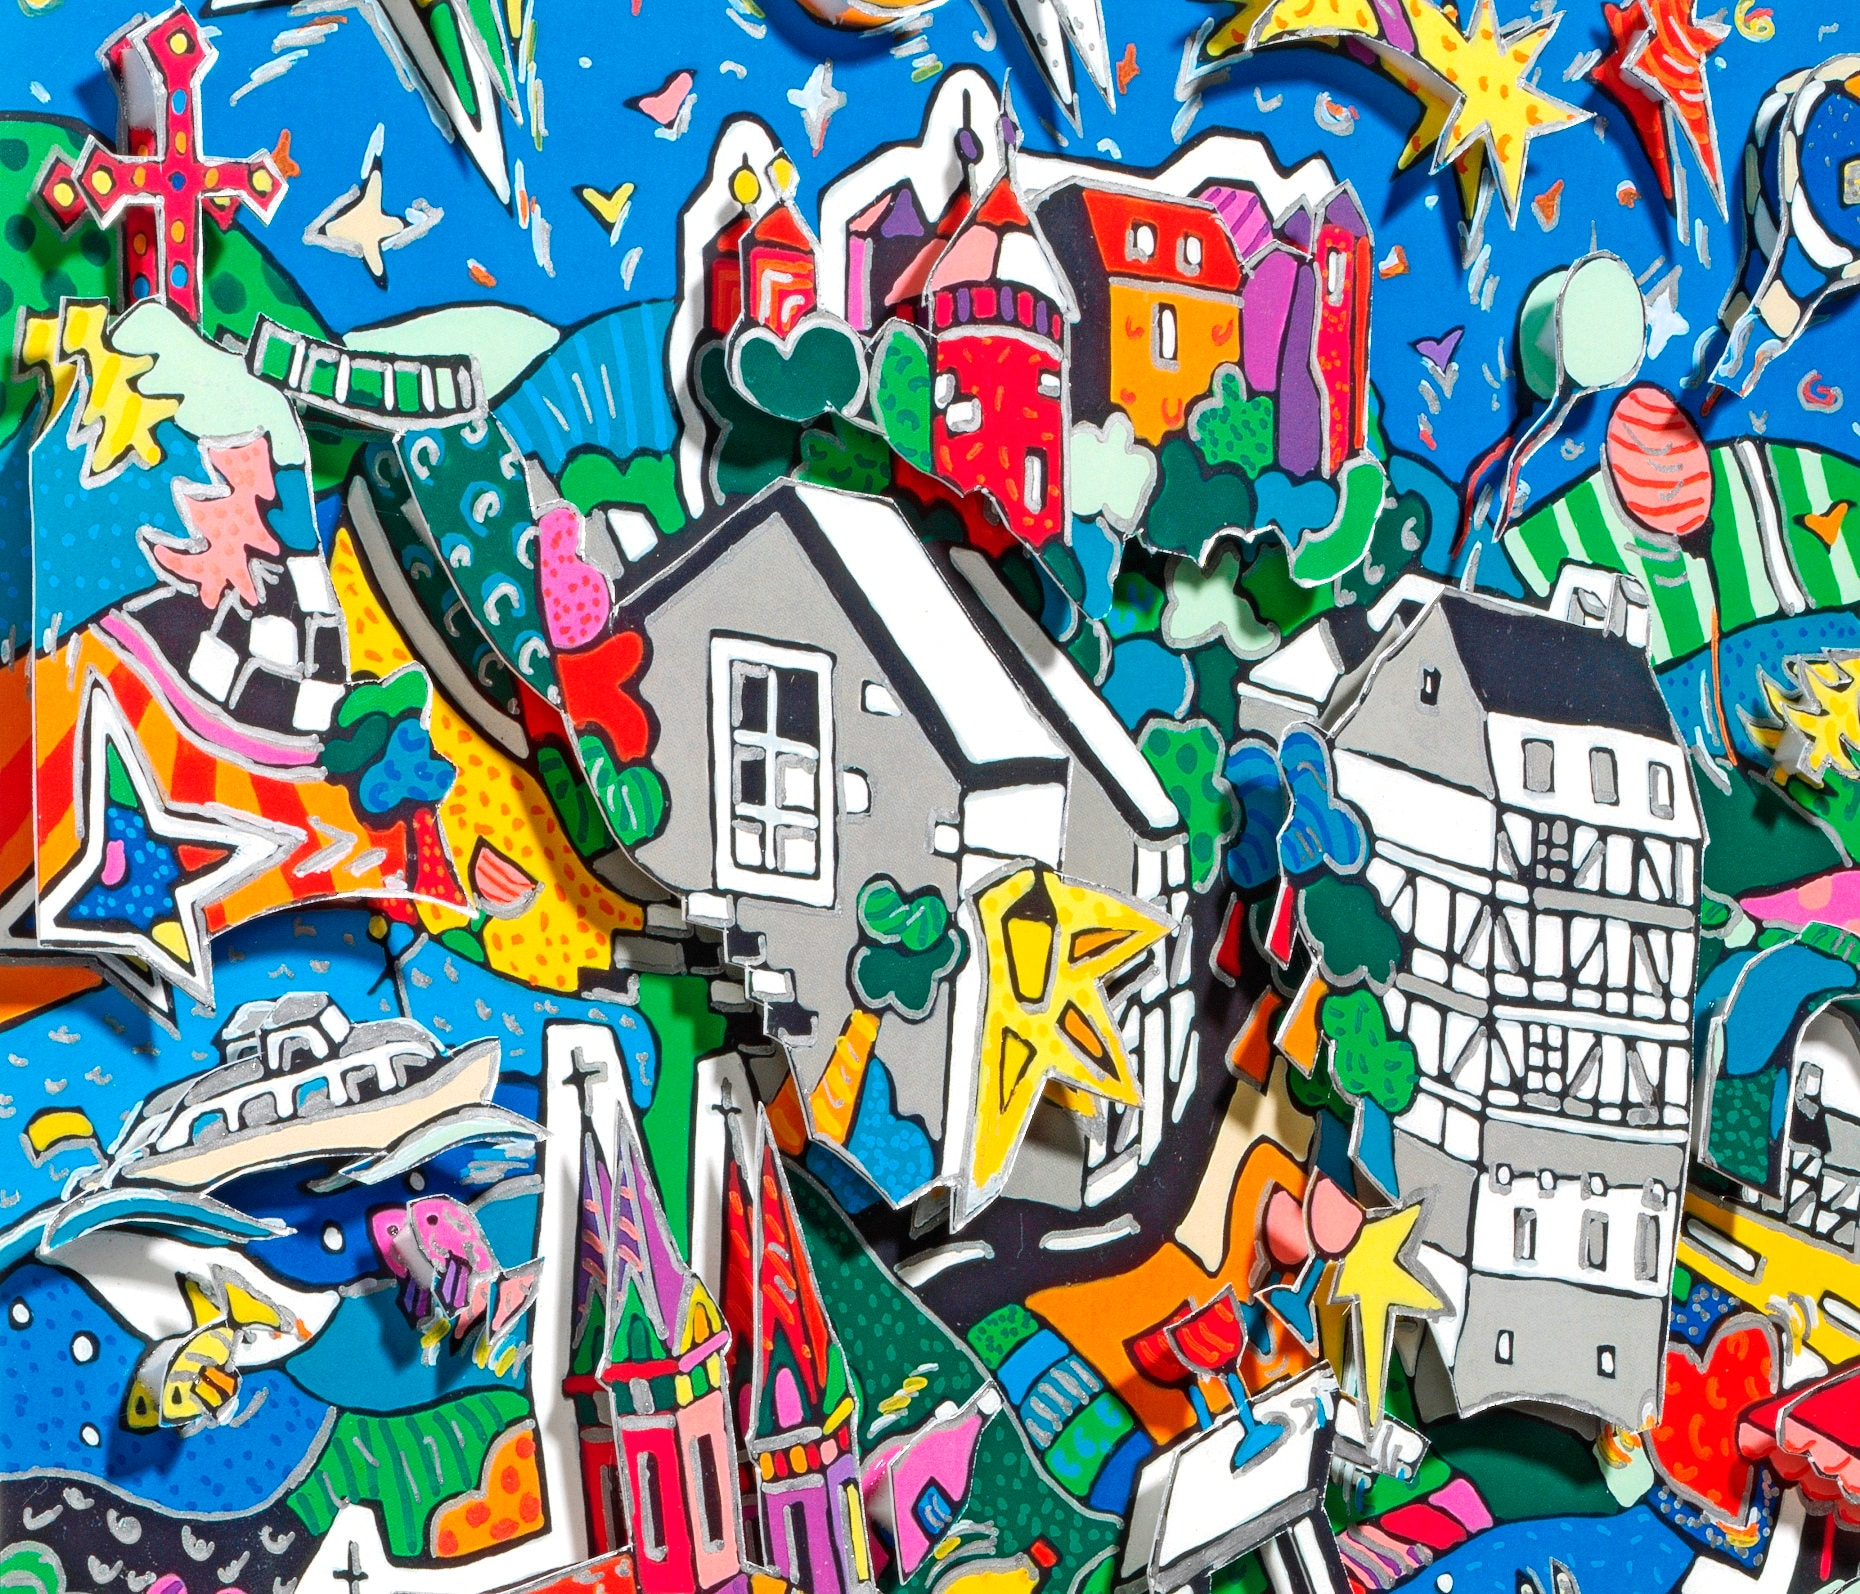 monschau eifel 3d pop art bild skyline souvenir druck burg. Black Bedroom Furniture Sets. Home Design Ideas